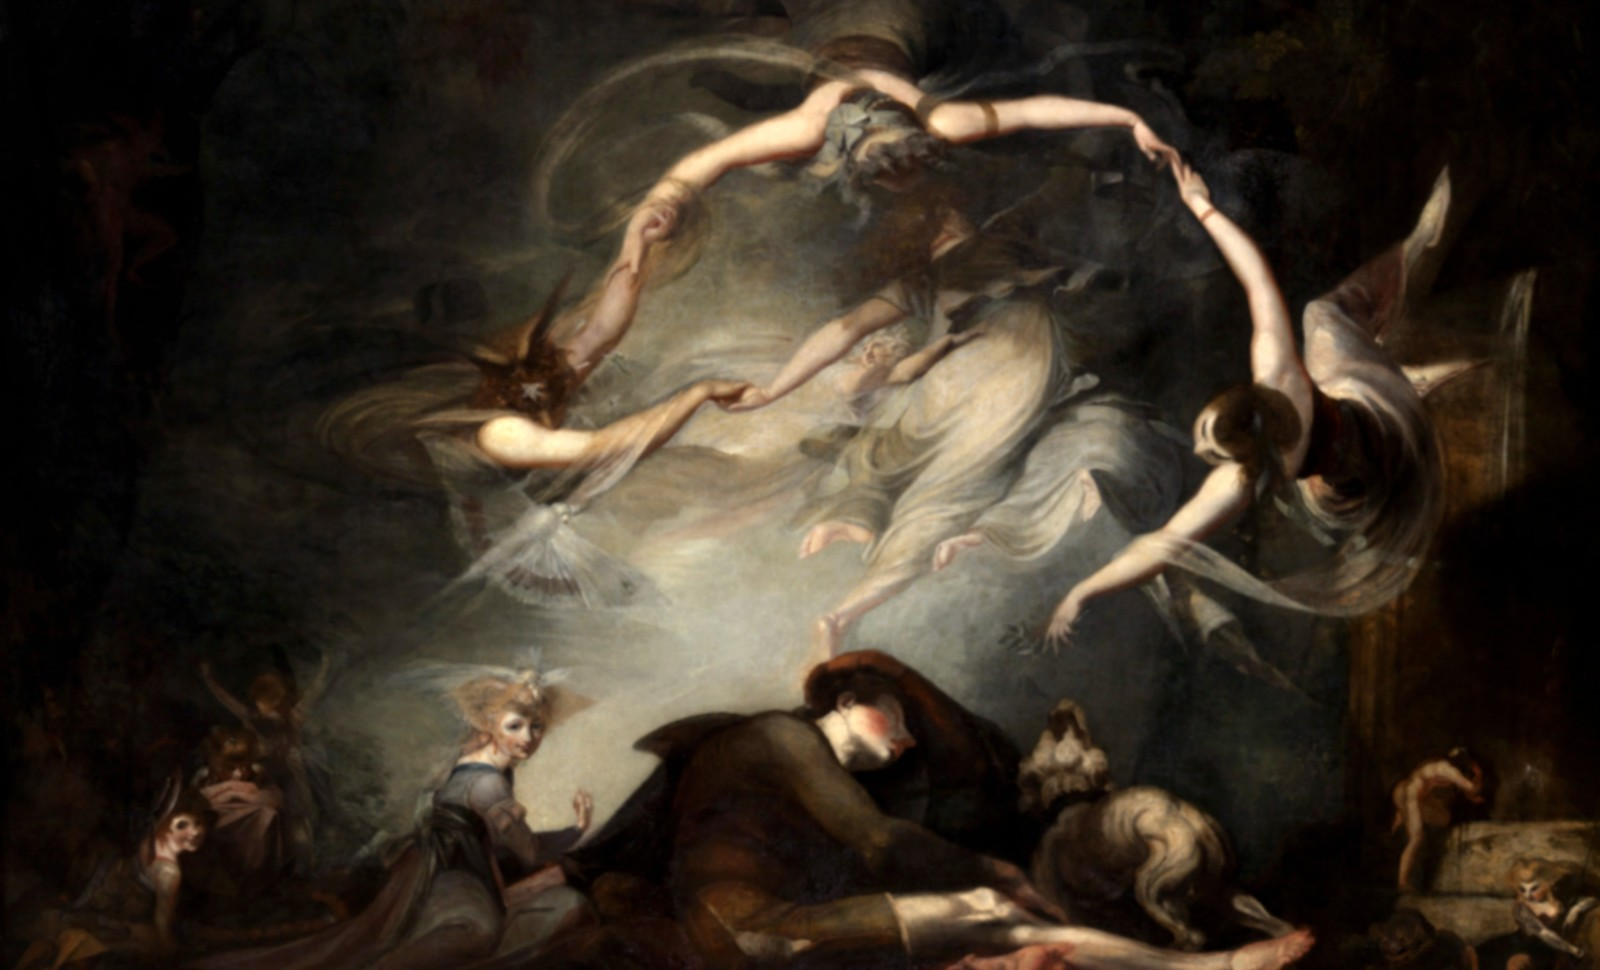 The Shepherd's Dream, Johann Heinrich Fussli (Henri Fuseli en anglais), 1793 © Tate, London 2019/RMN-GP